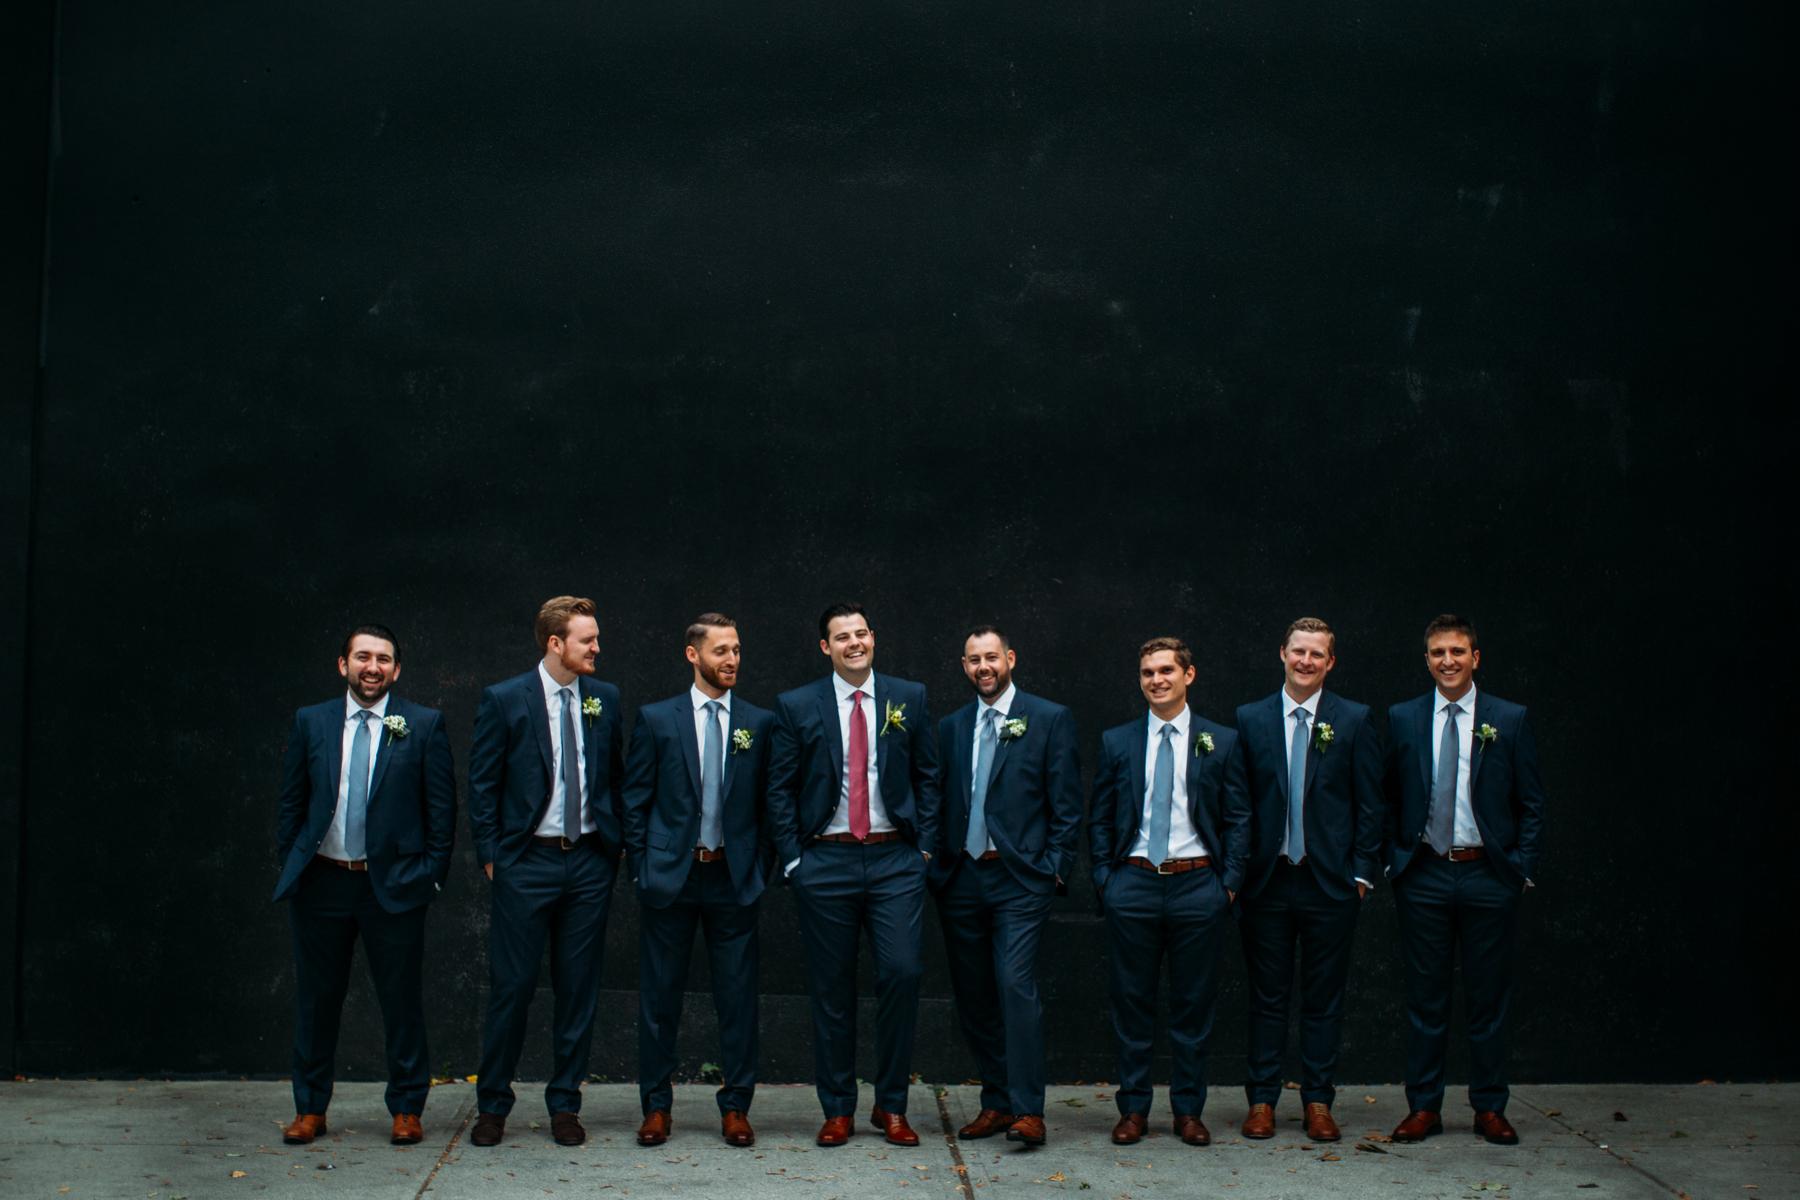 Downtown toronto wedding party portraits